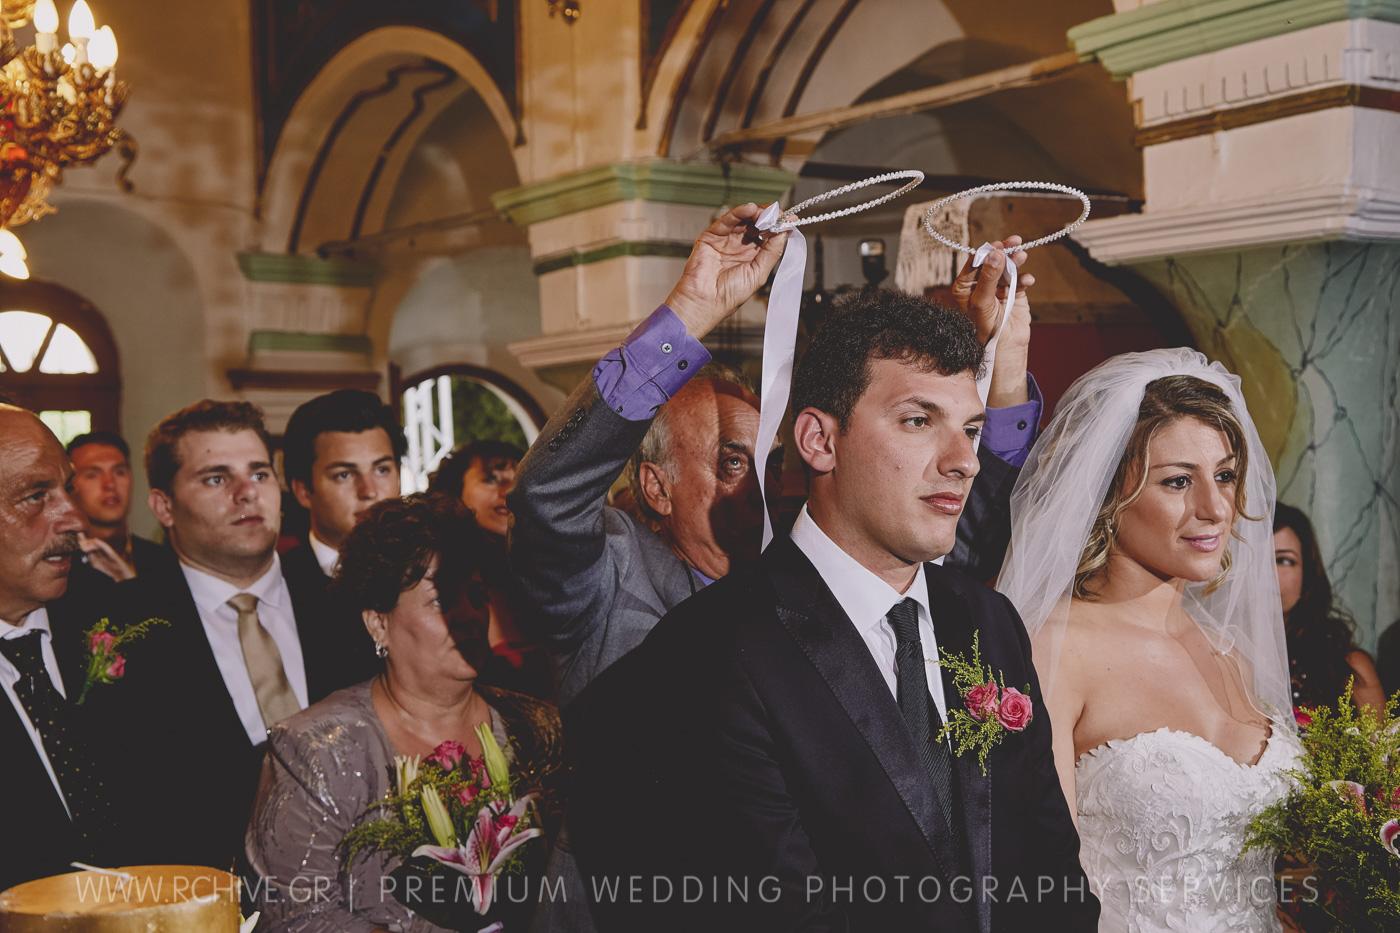 wedding traditions photos greece